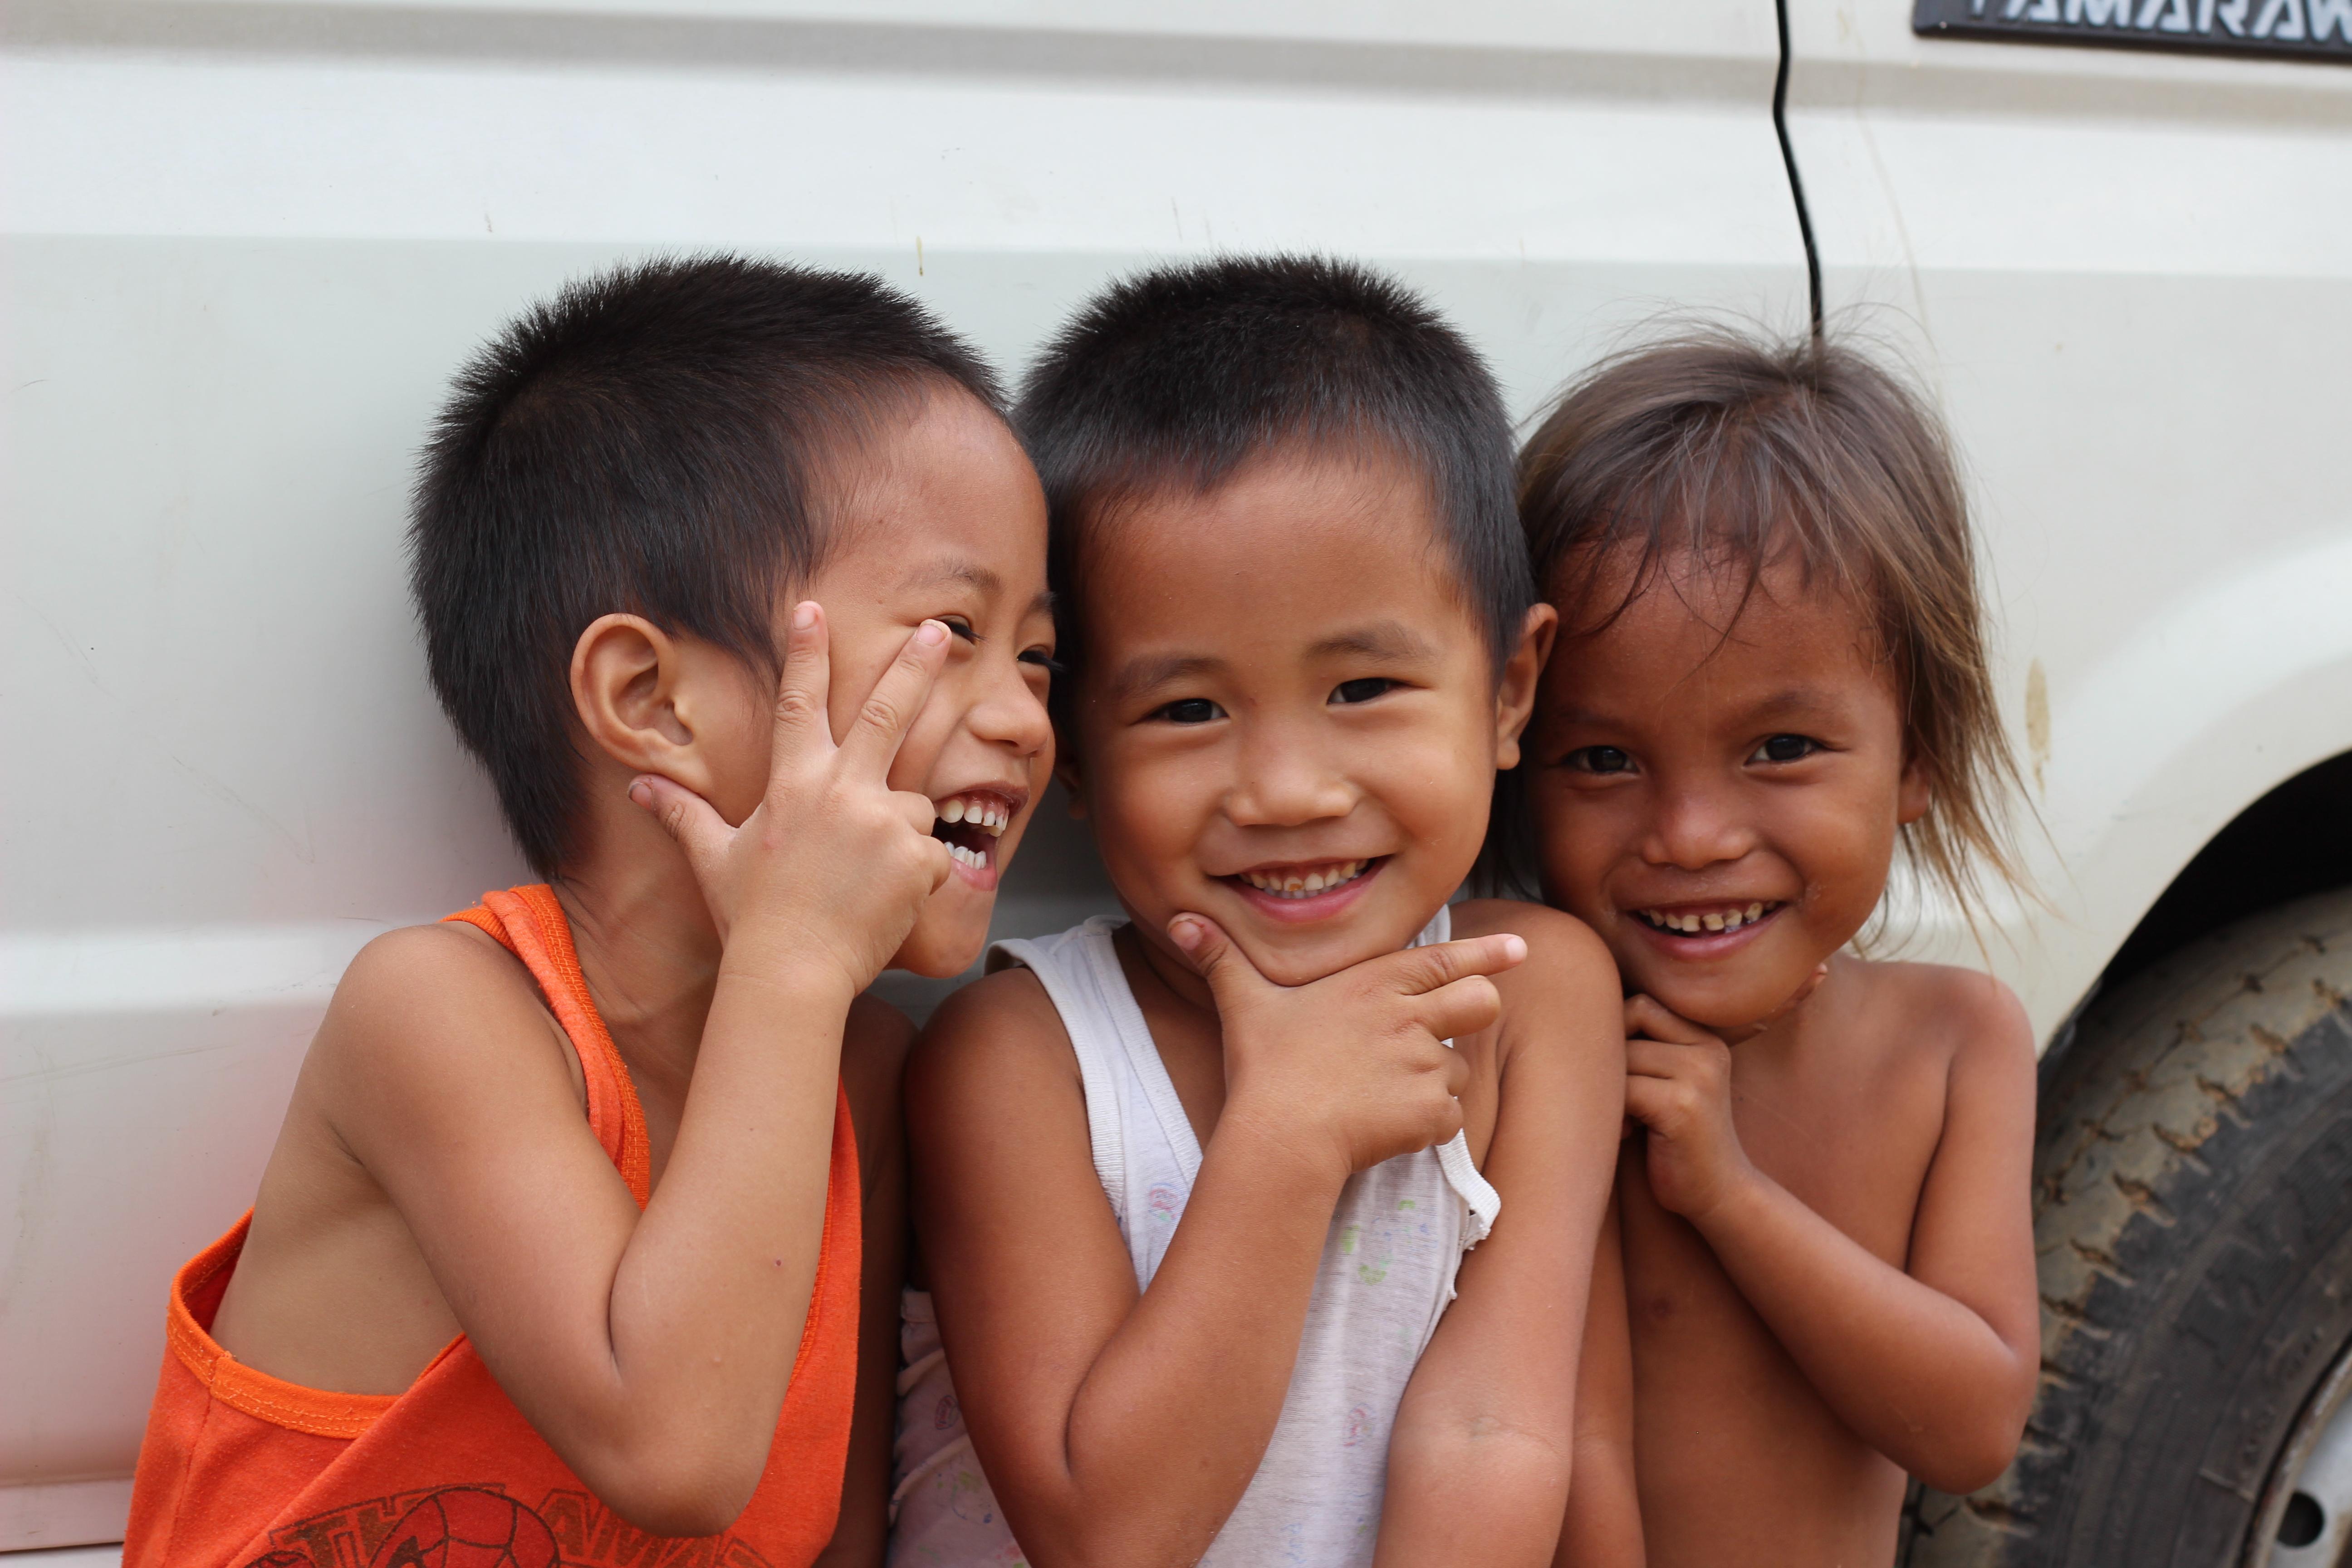 filipino kids - photo #31